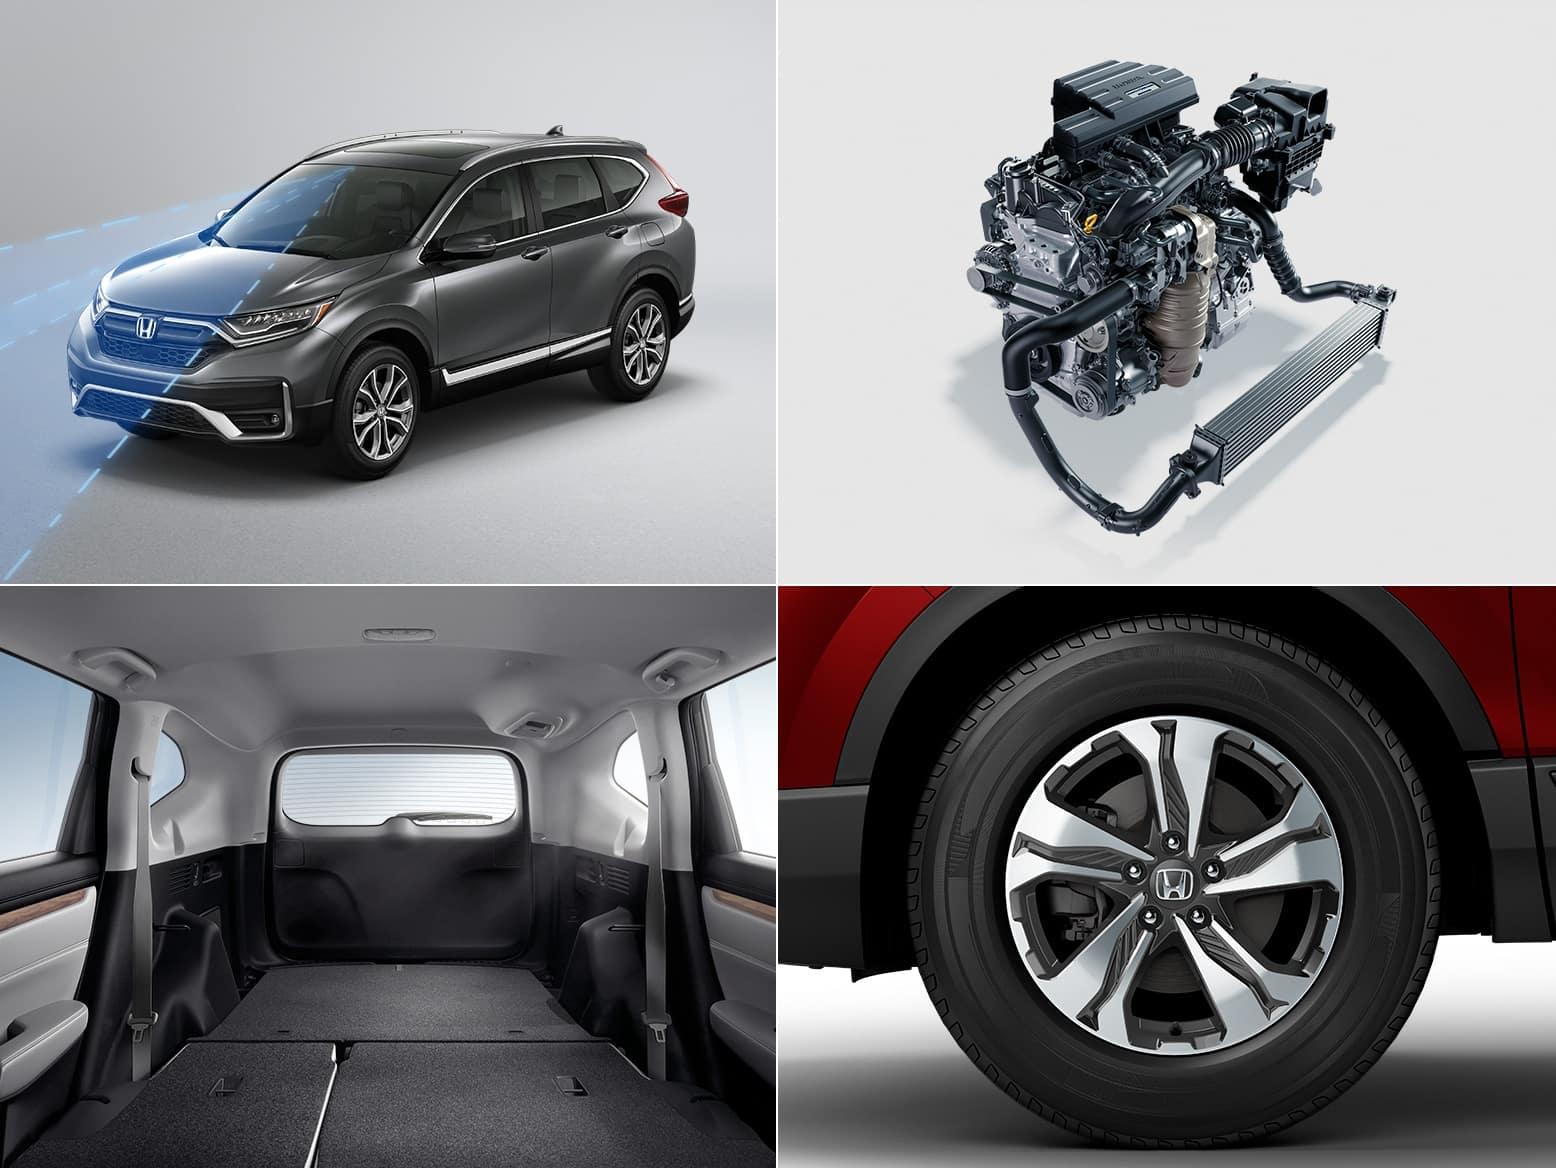 2021 Honda CR-V LX features